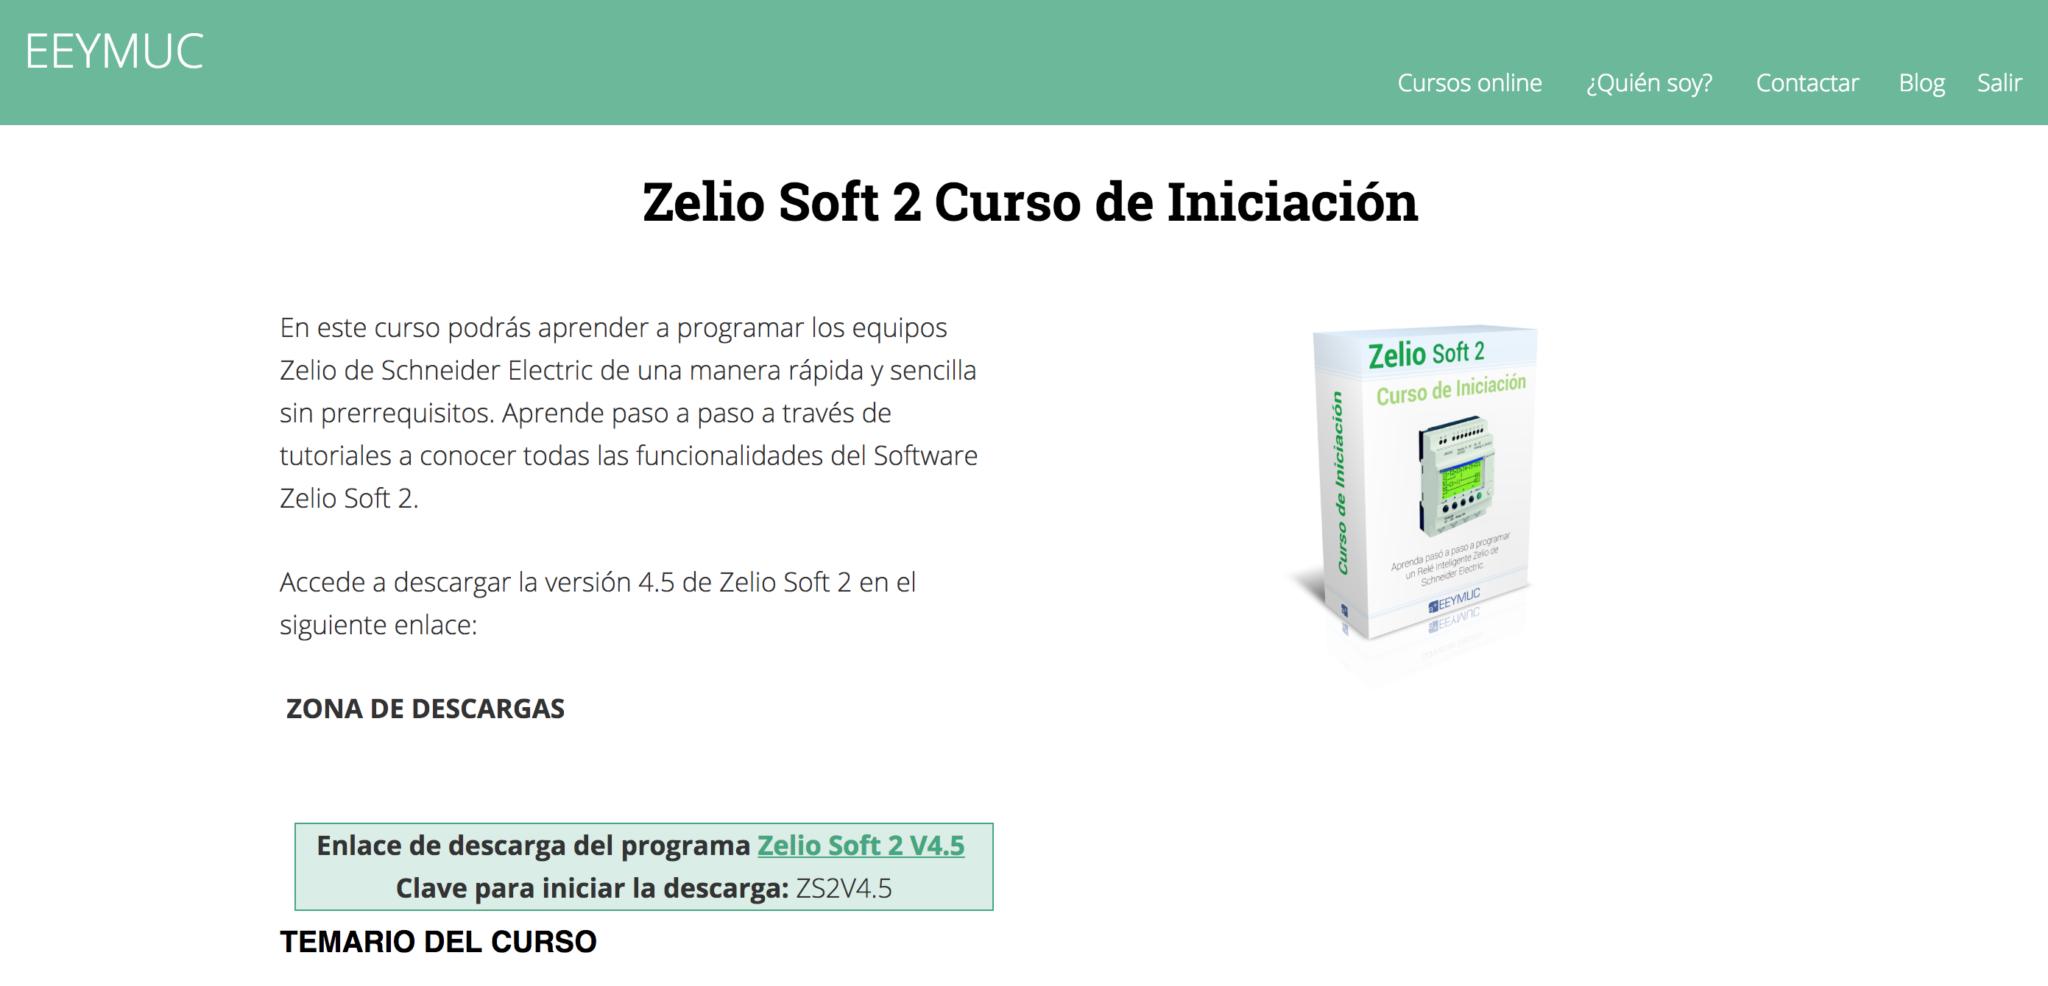 Curso zelio soft 2 en eeymuc